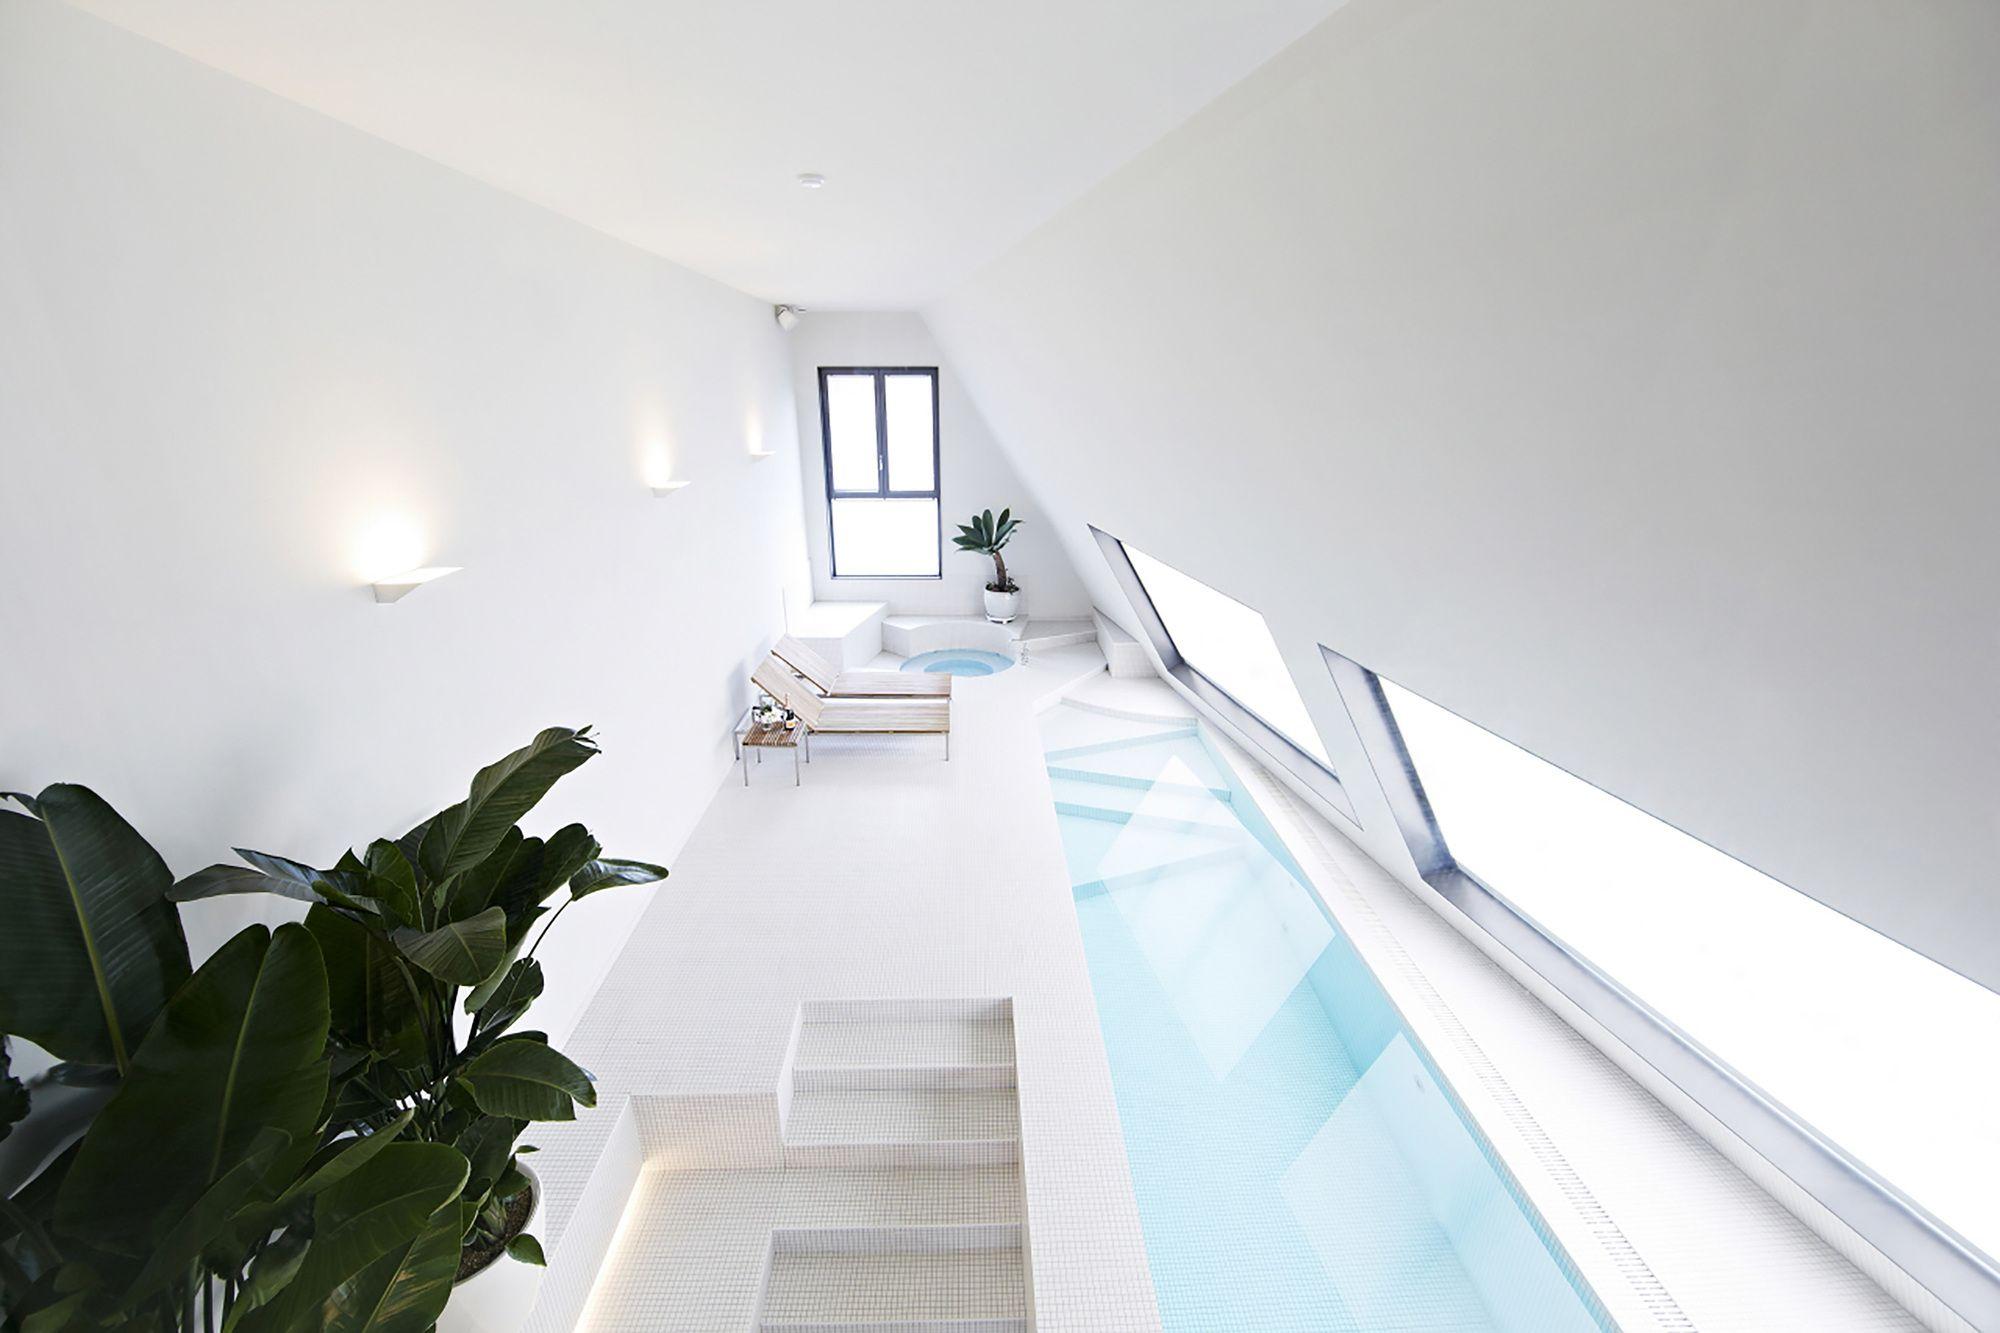 547e99eee58ece885e000083_snow-hotel-1990-uao_spa_pool_penthouse_01-mto.jpg (2000×1333)